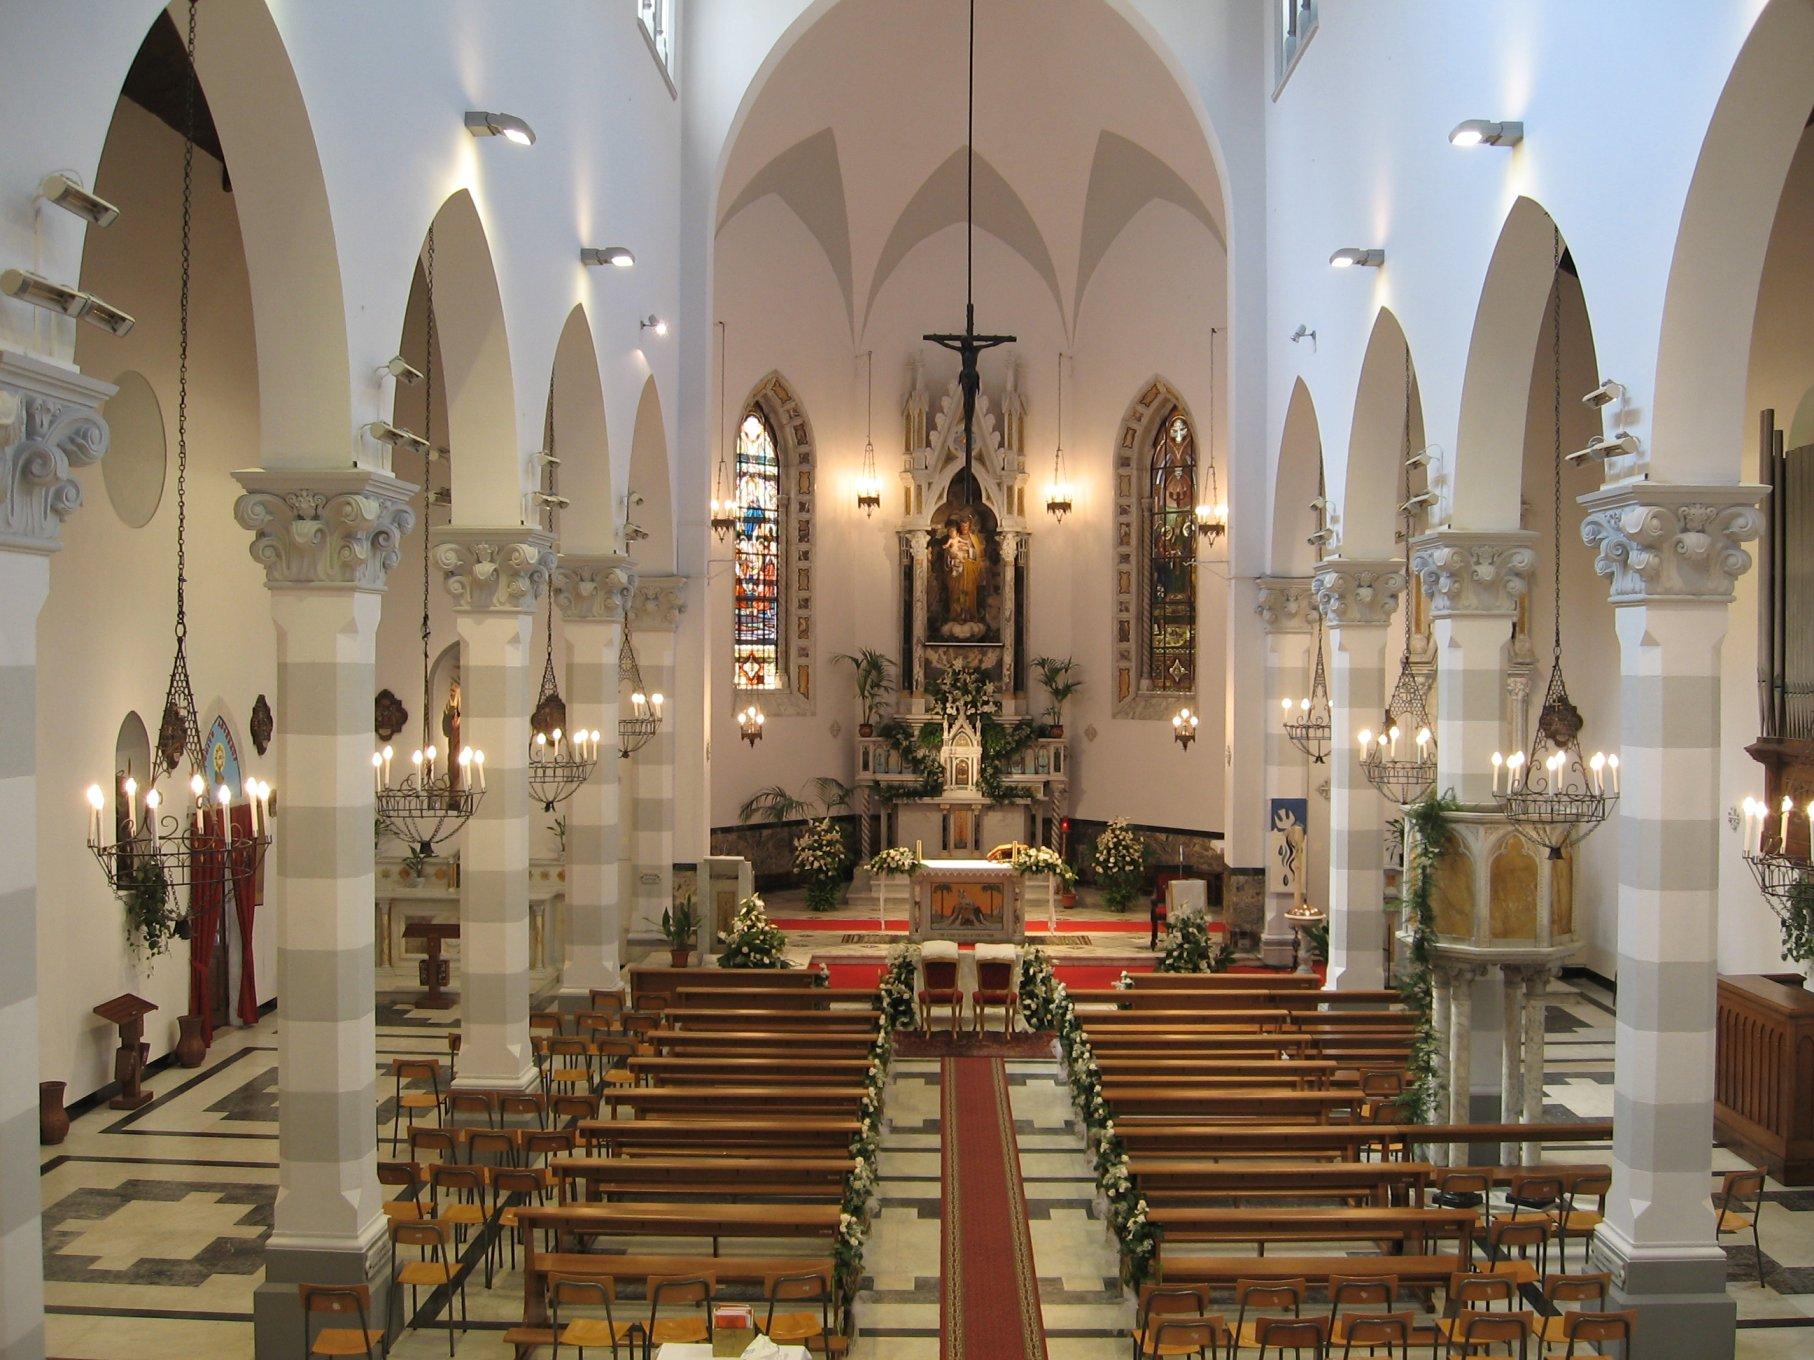 Chiesa_interno-2008-07-26-14.58.57.jpg